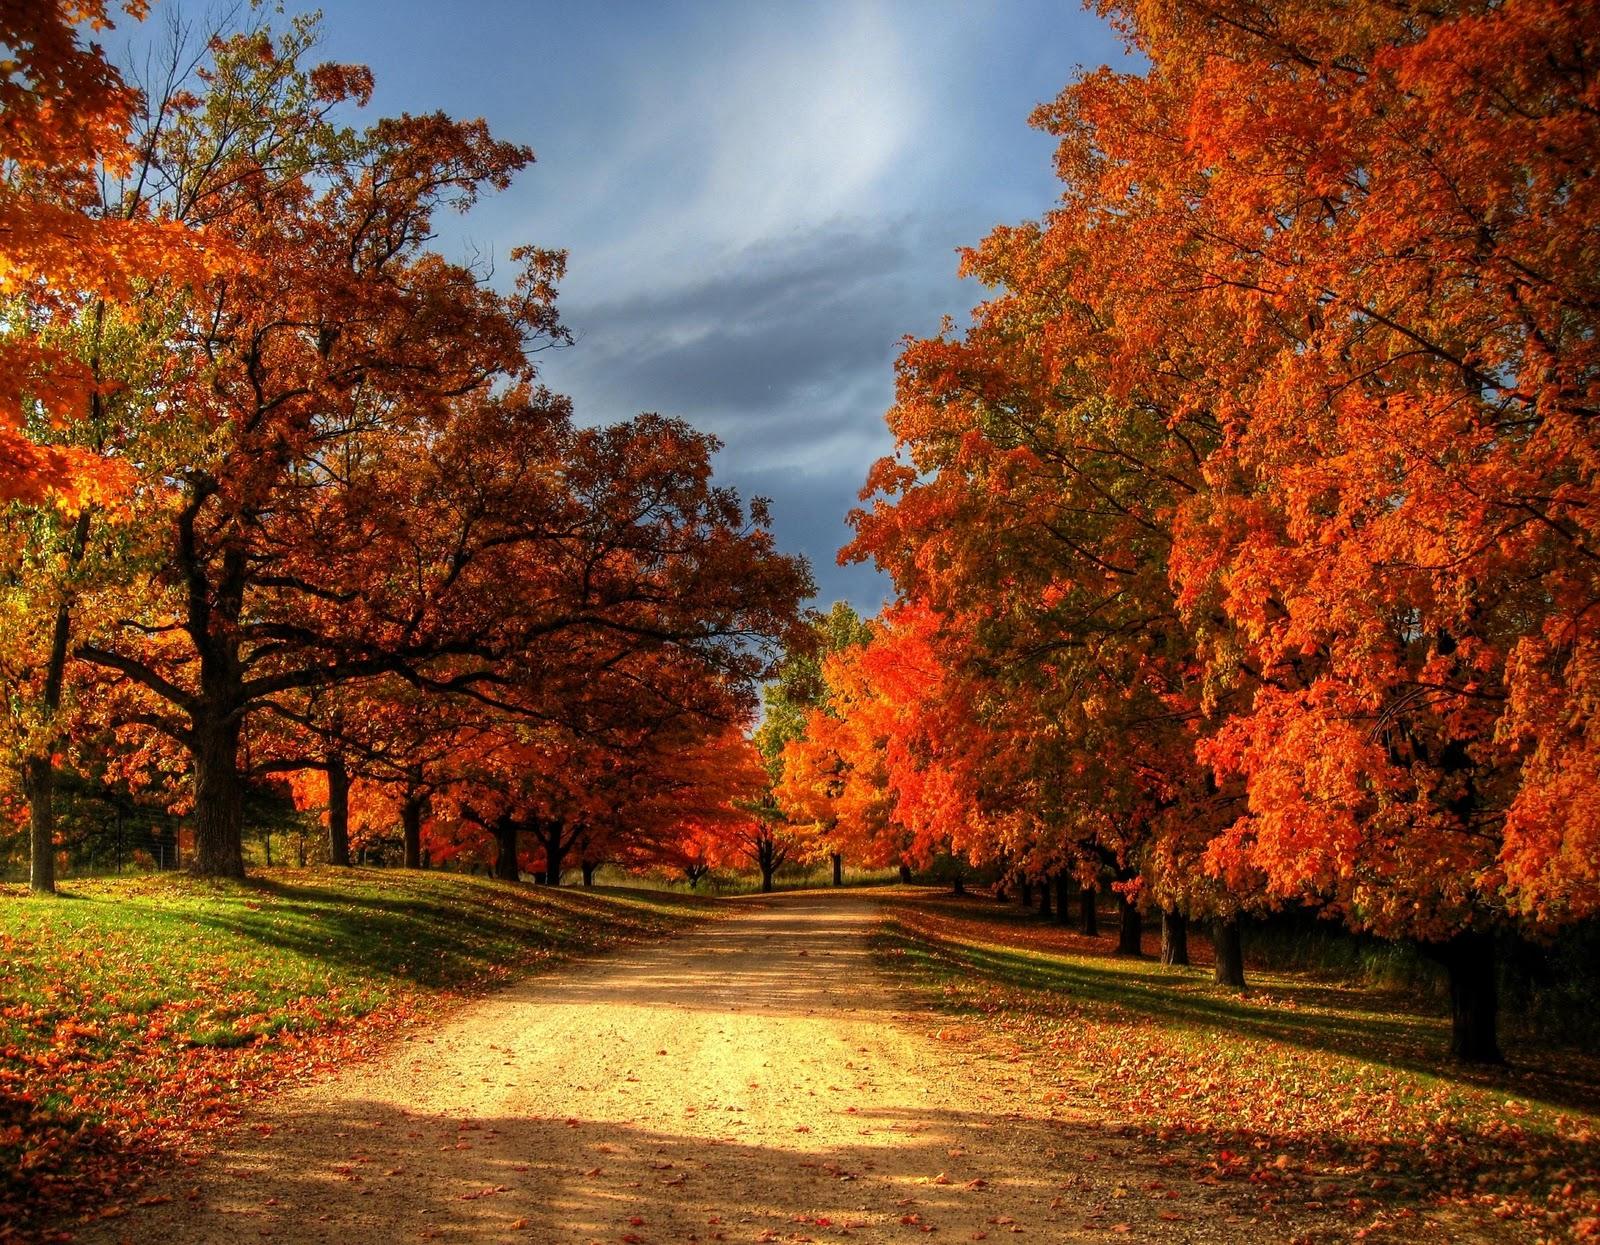 Desktop Calendar Like Webshots Webshots Free Wallpaper Desktop Wallpaper And Free Colors Of Autumn Quotes Quotesgram